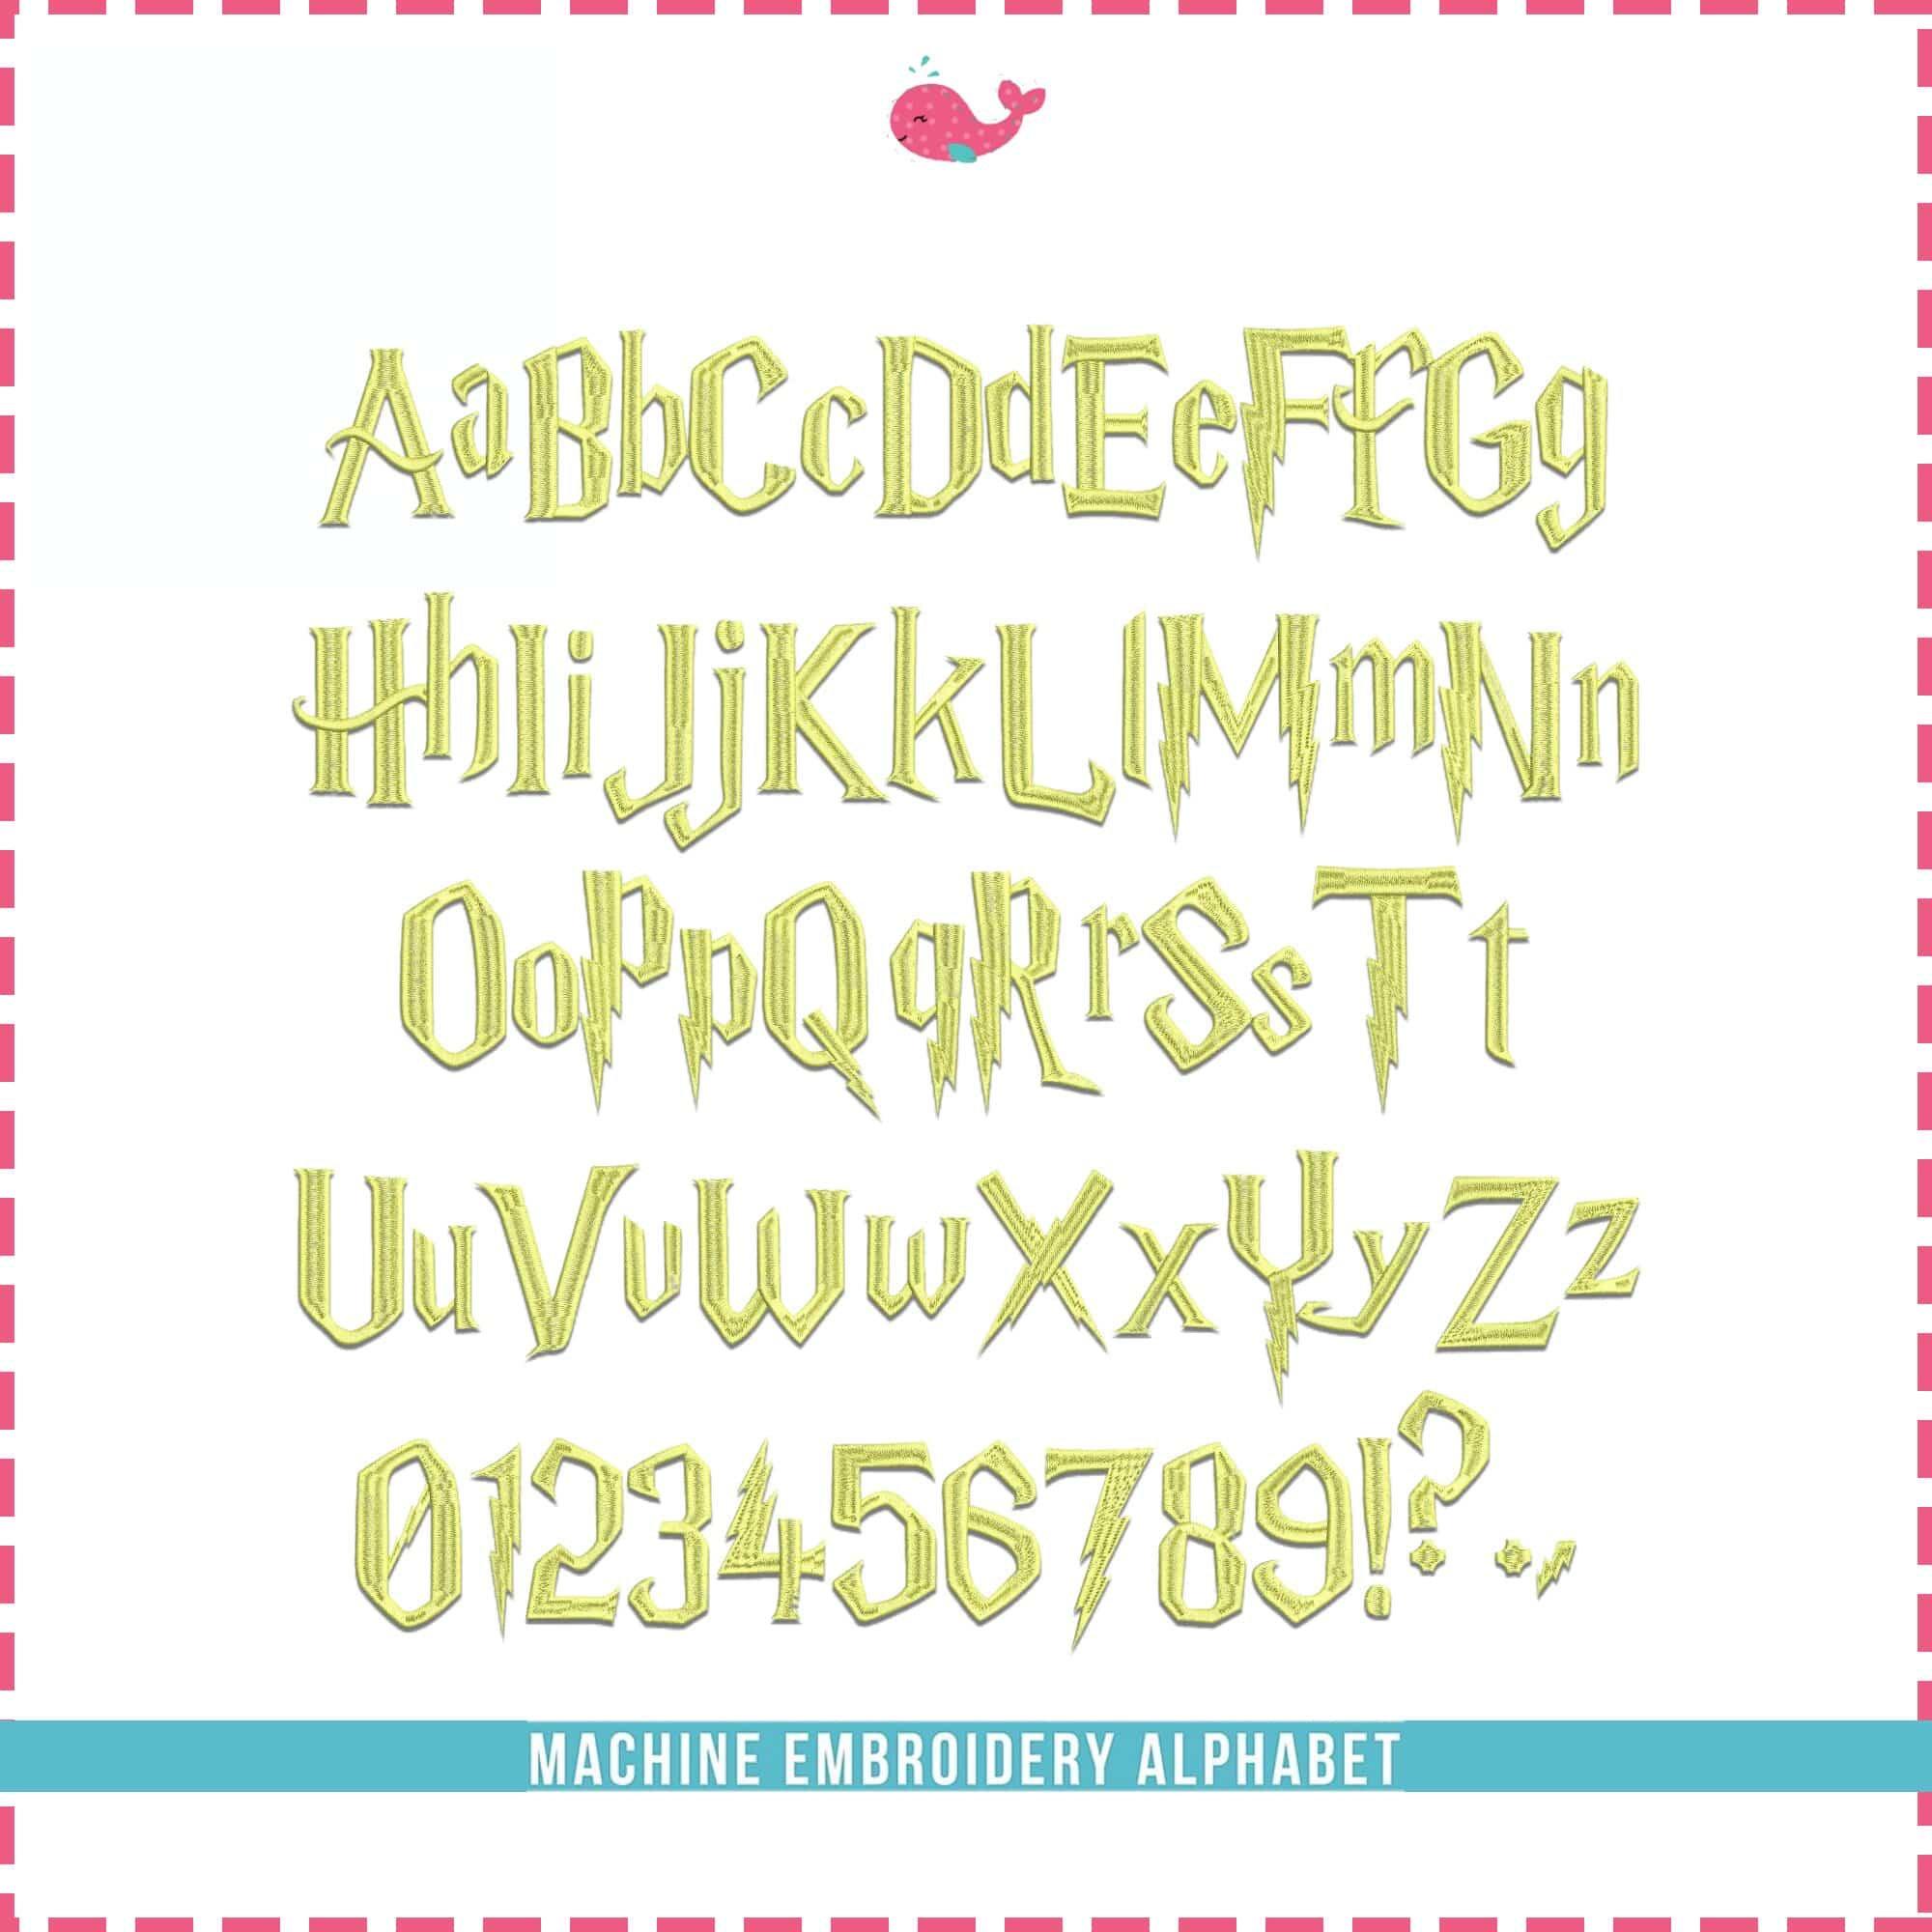 Magic School Font Embroidery Design Monogram Alphabet 4 Sizes 8 Formats BX